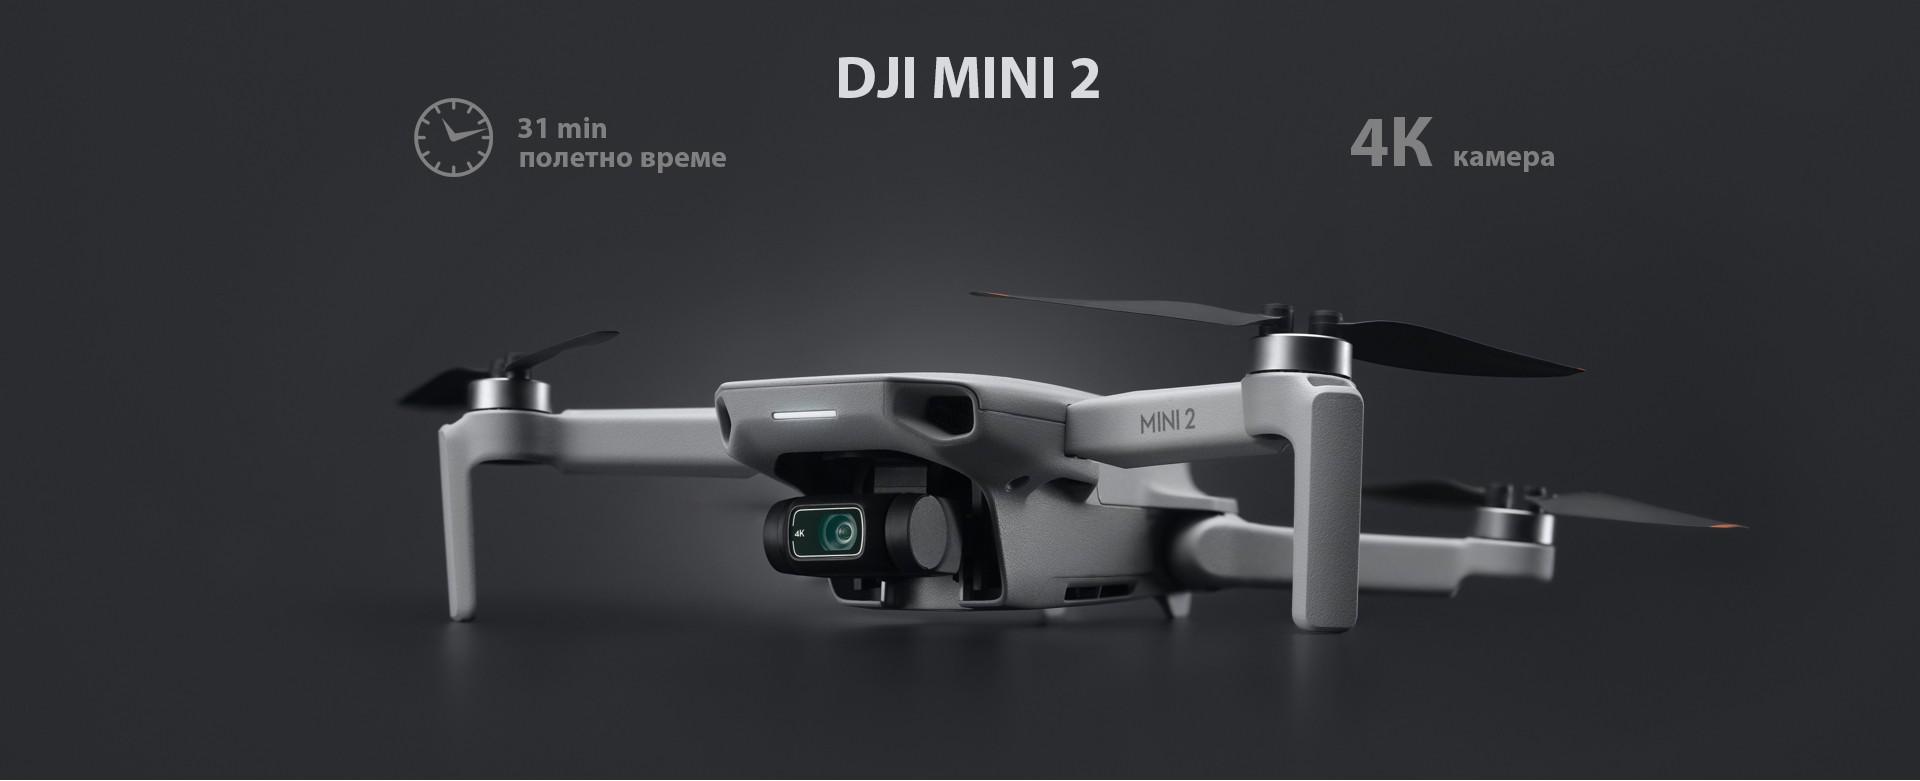 DJI Mini2 | AeroCam.bg